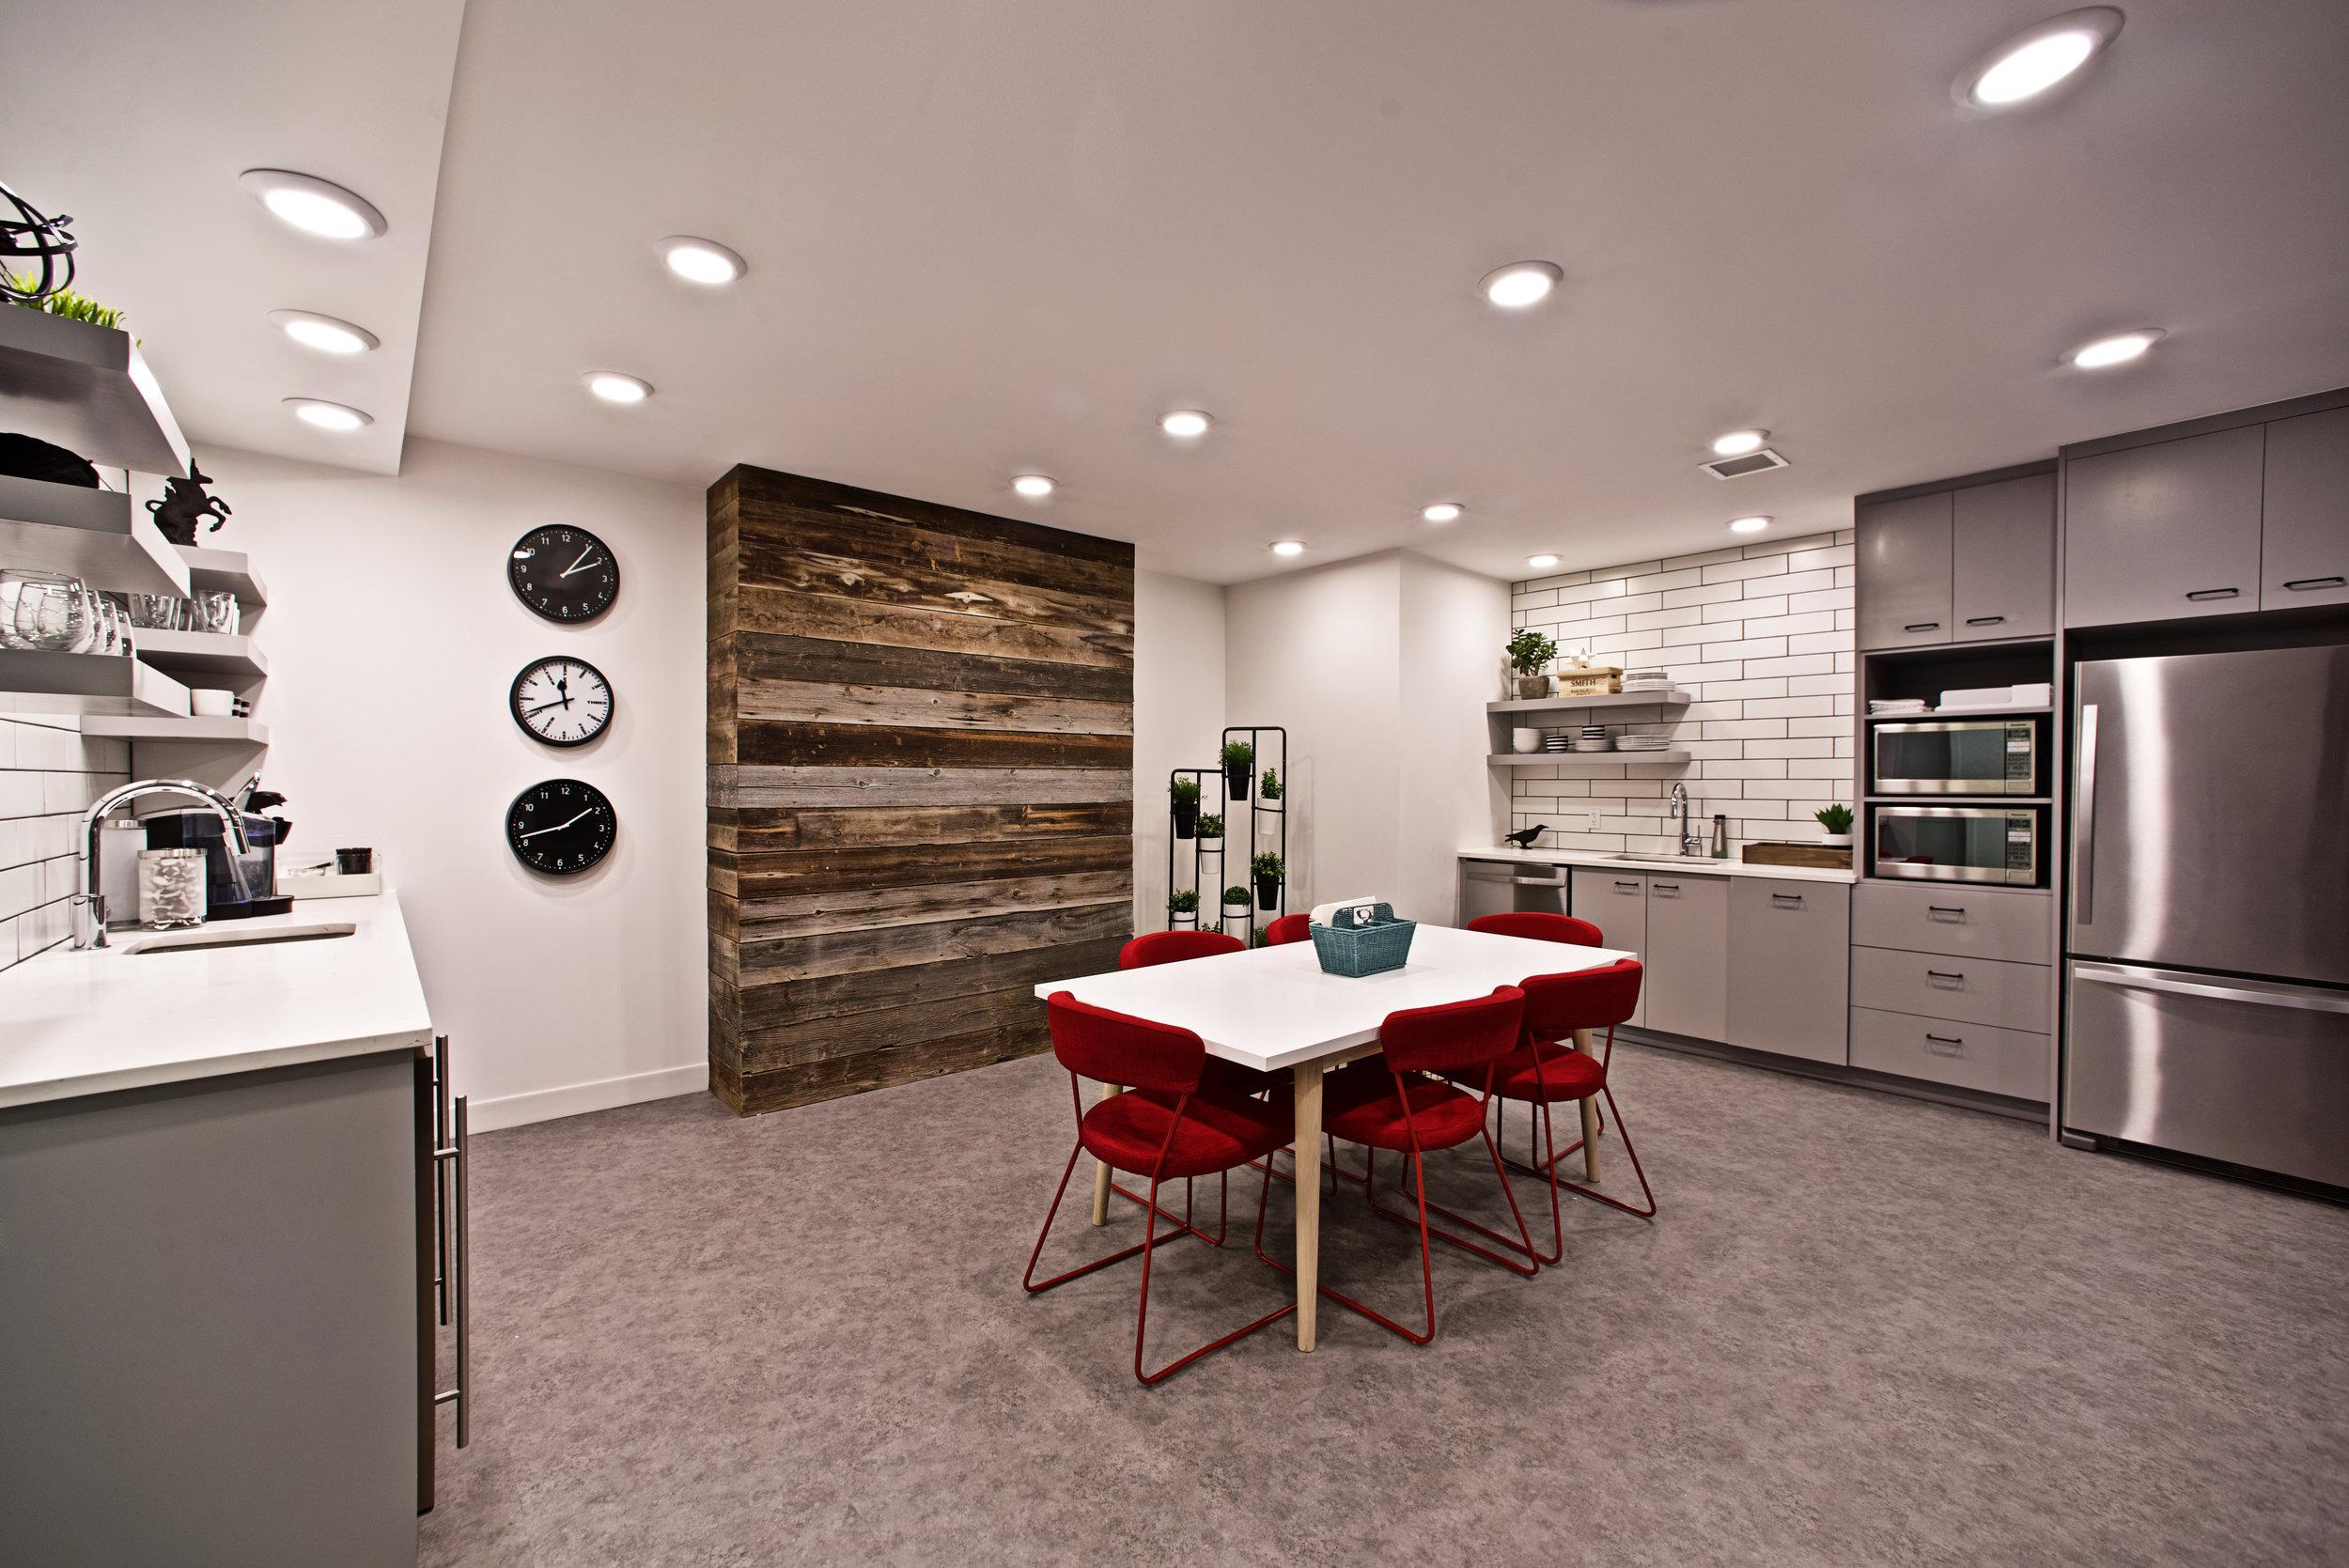 Coworking Space Kitchen